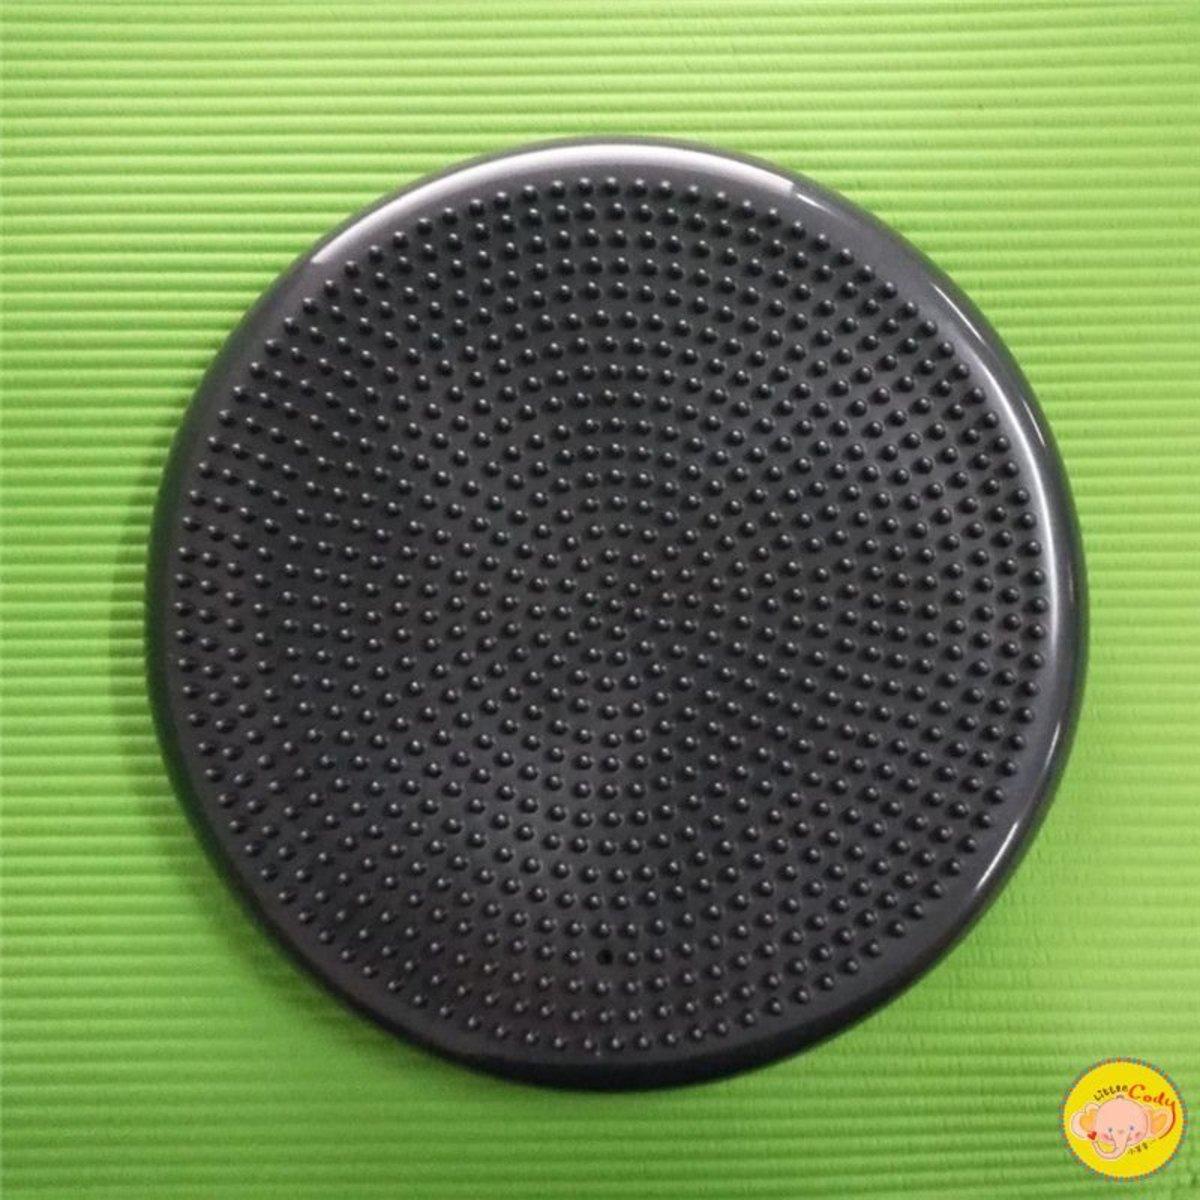 【Black】Yoga Massage Balance Pad【1PC】